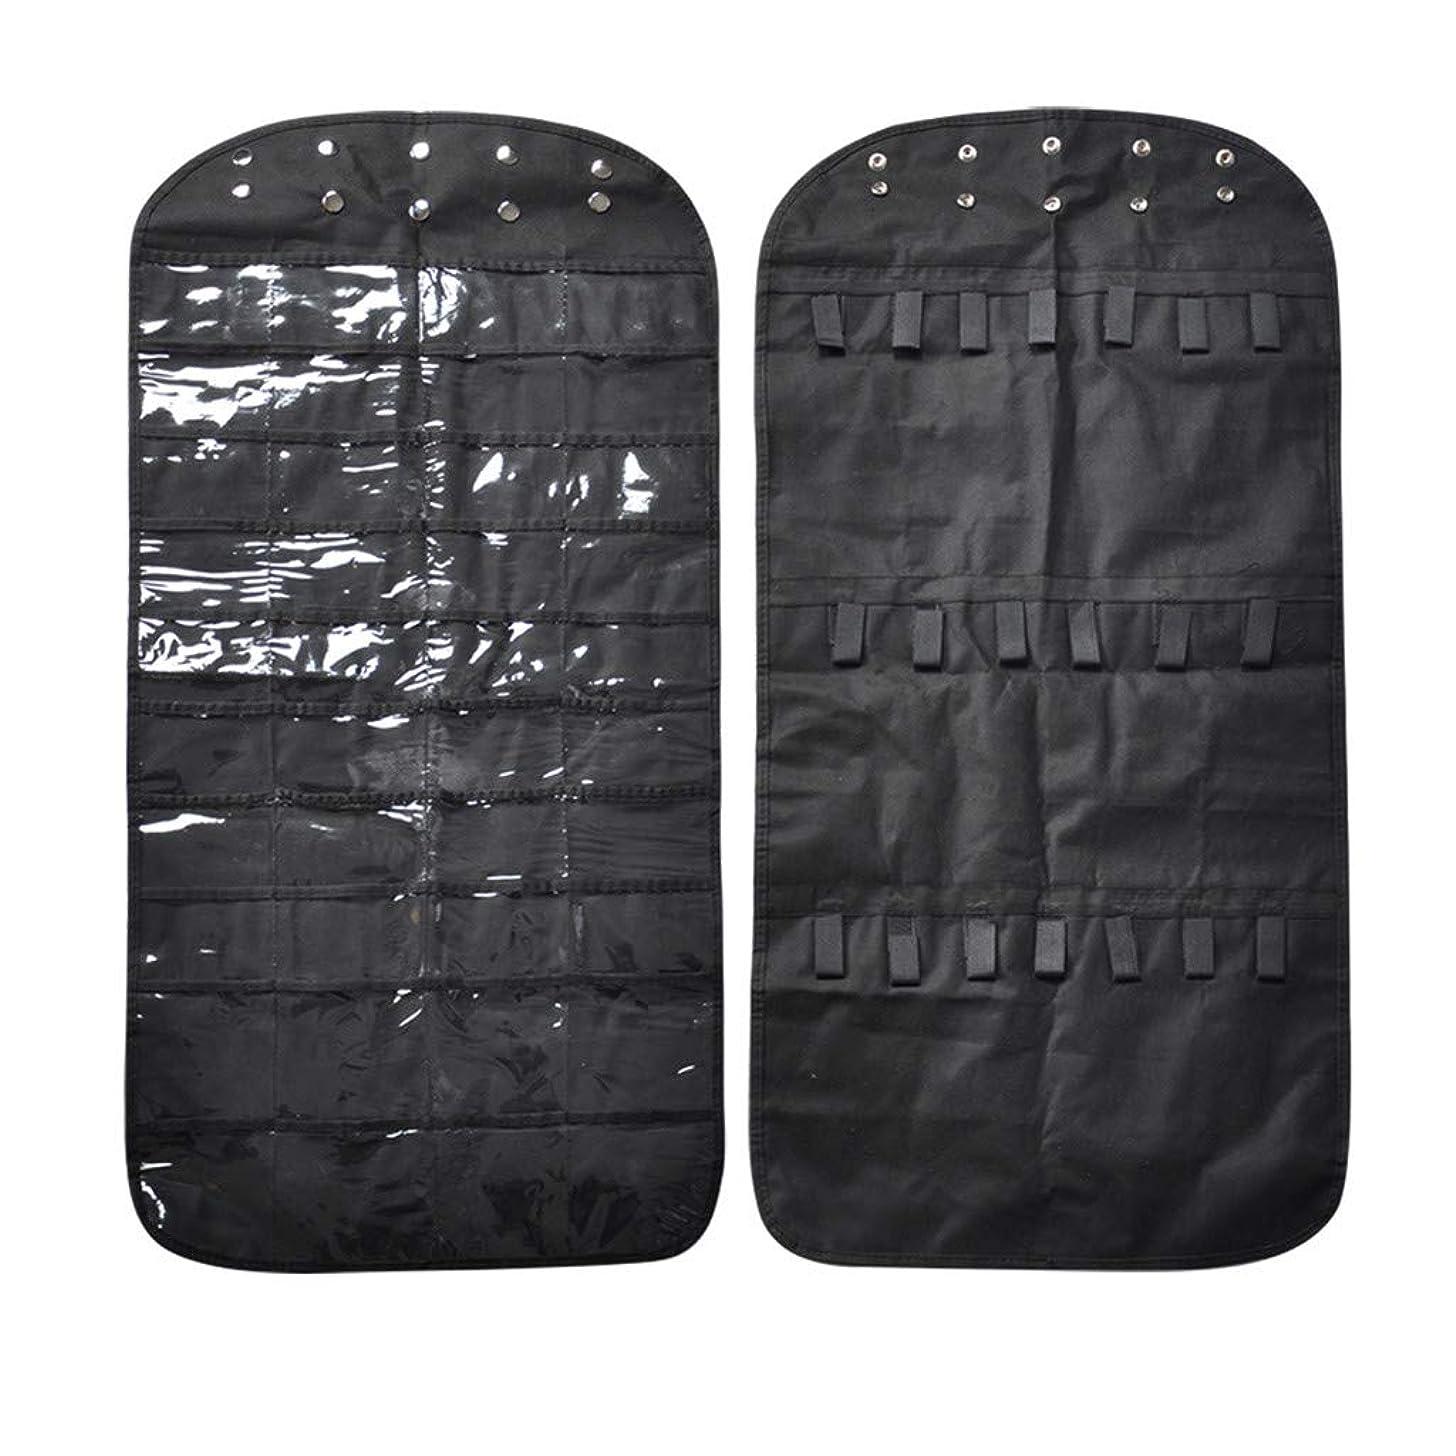 Jewelry Storage Bag, PBudi 80 Pockets Jewelry Hanging Bag Display Bag Non-Woven Fabric (BK0)